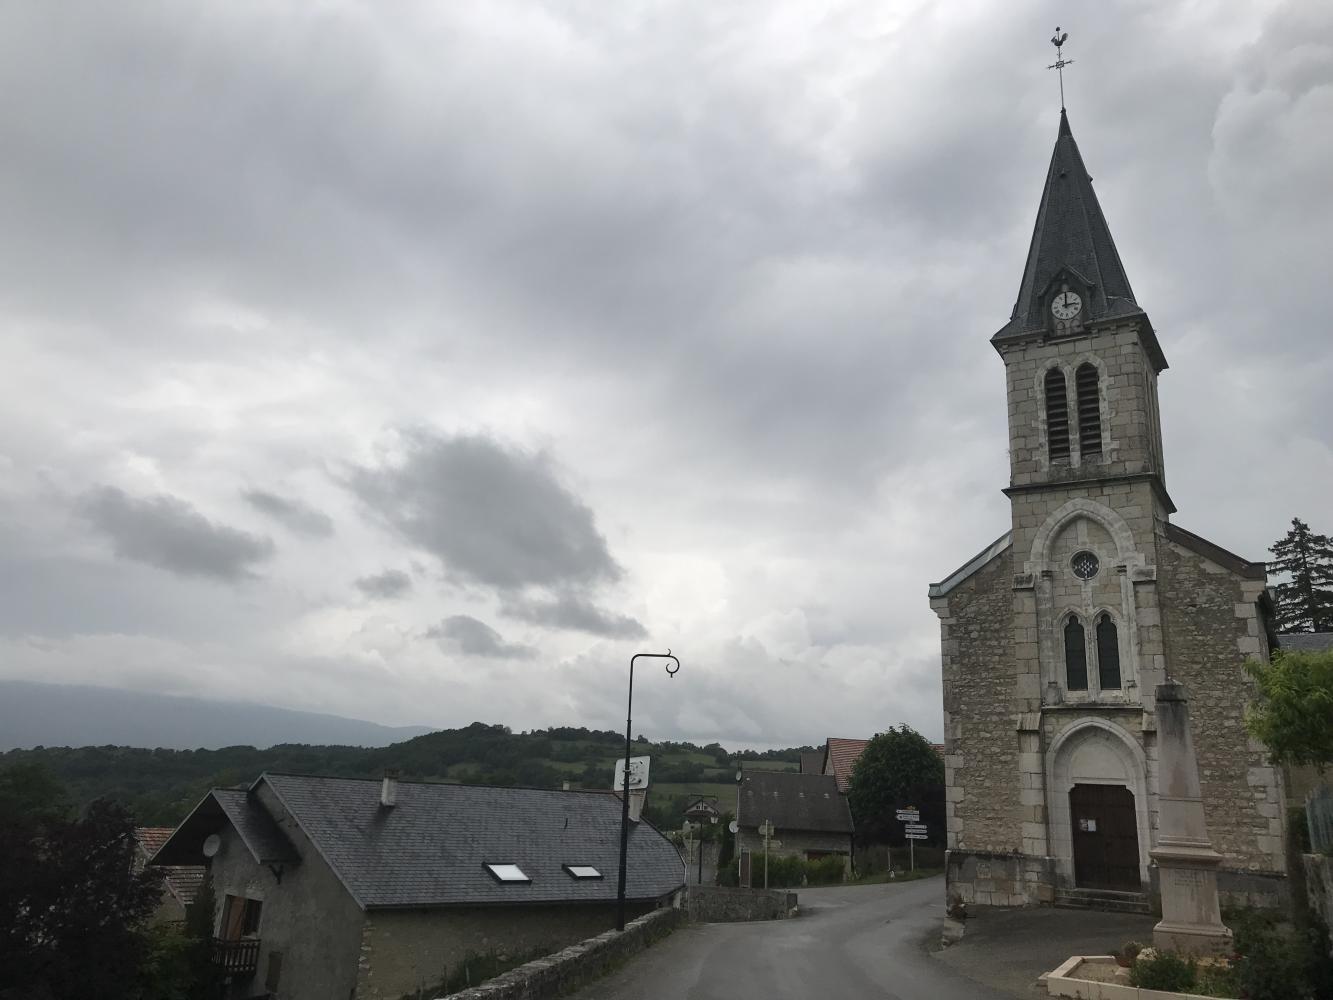 Col du Grand Colombiere - Lochieu Bike Climb - PJAMM Cycling